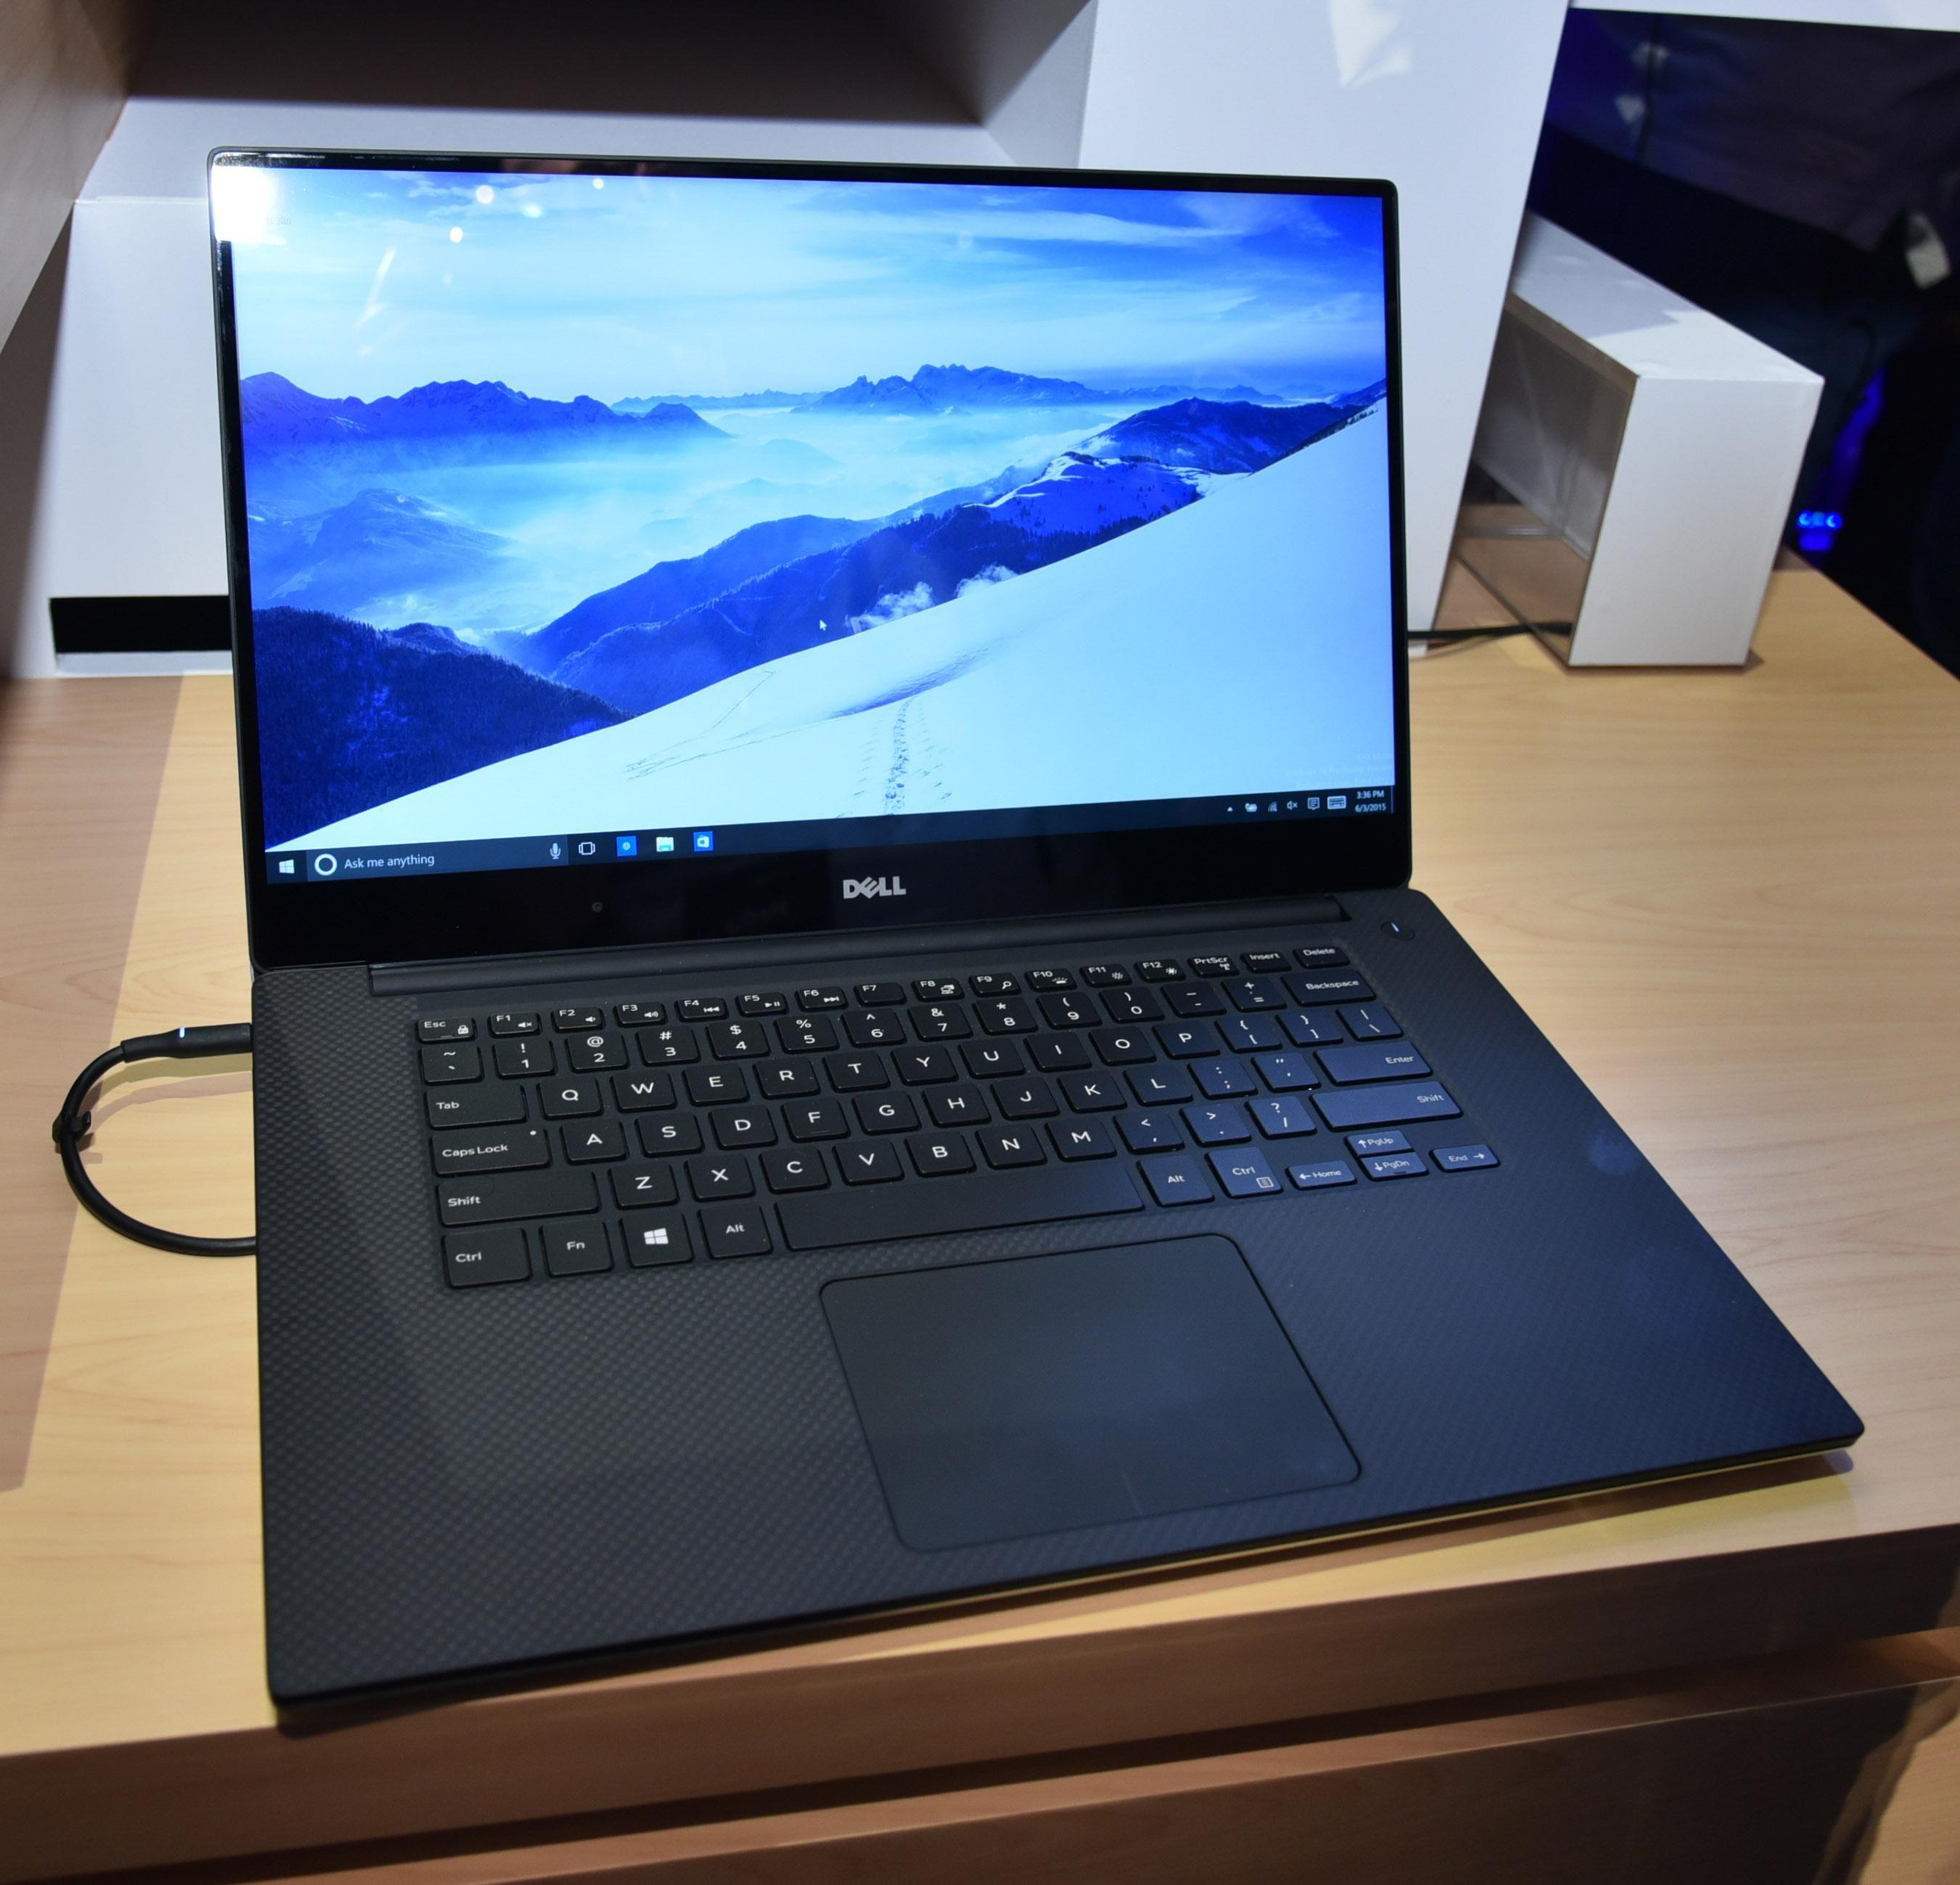 Amazon Dell Xps 15 Laptop Dell Xps Dell Laptop